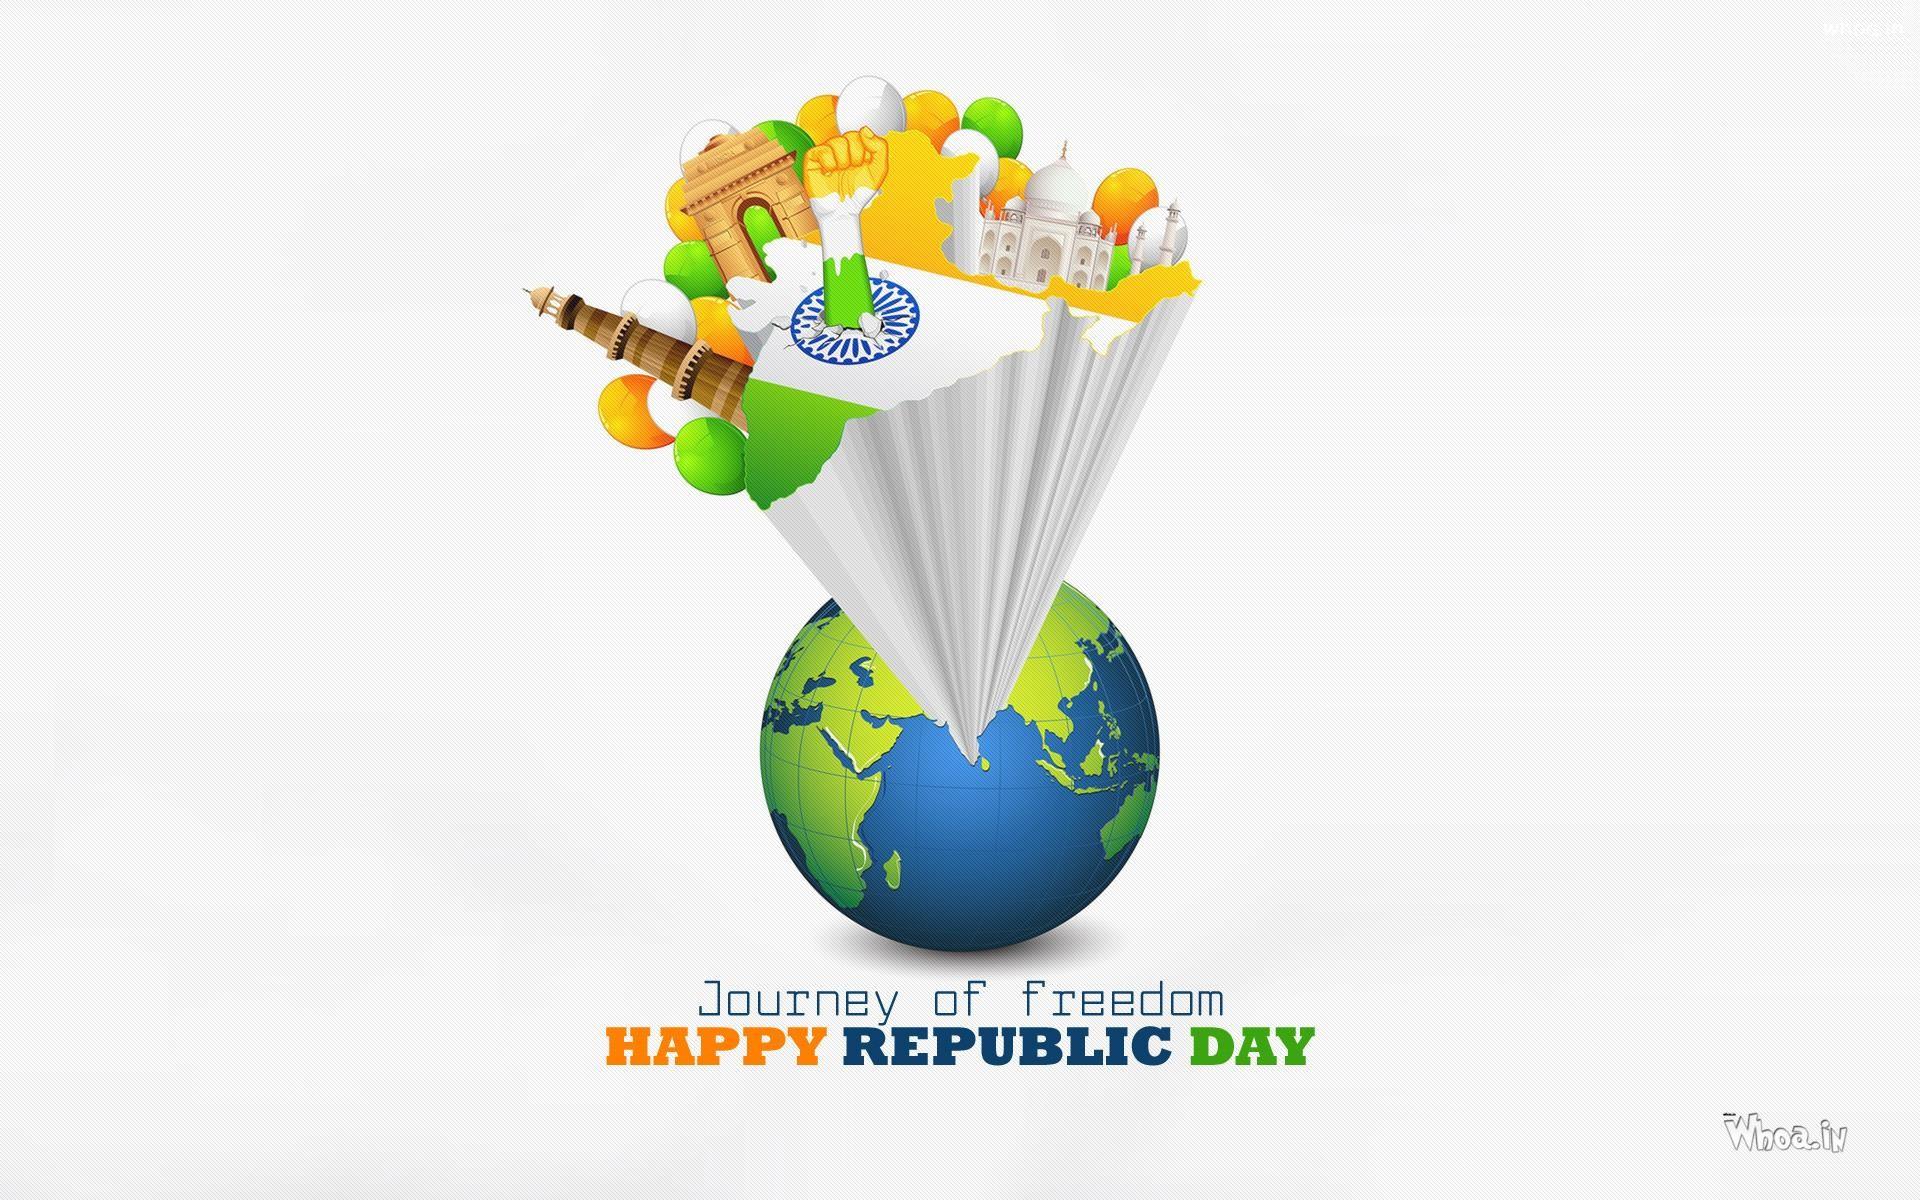 … Journey Of Freedom Happy Republic Day HD Wallpaper …